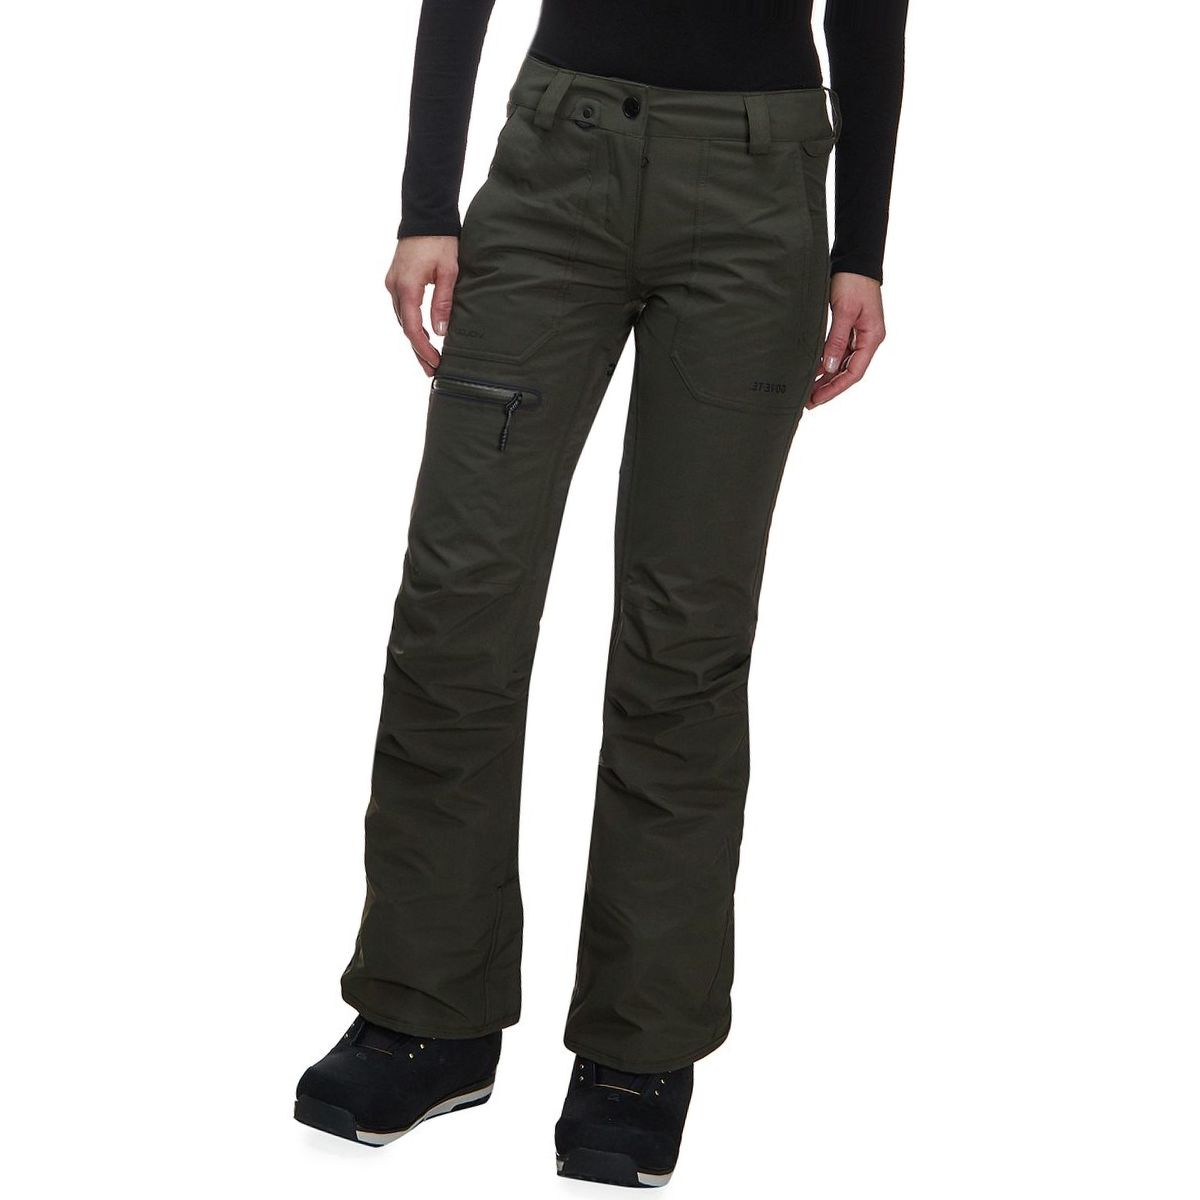 Volcom Knox Insulated Gore Pant - Women's